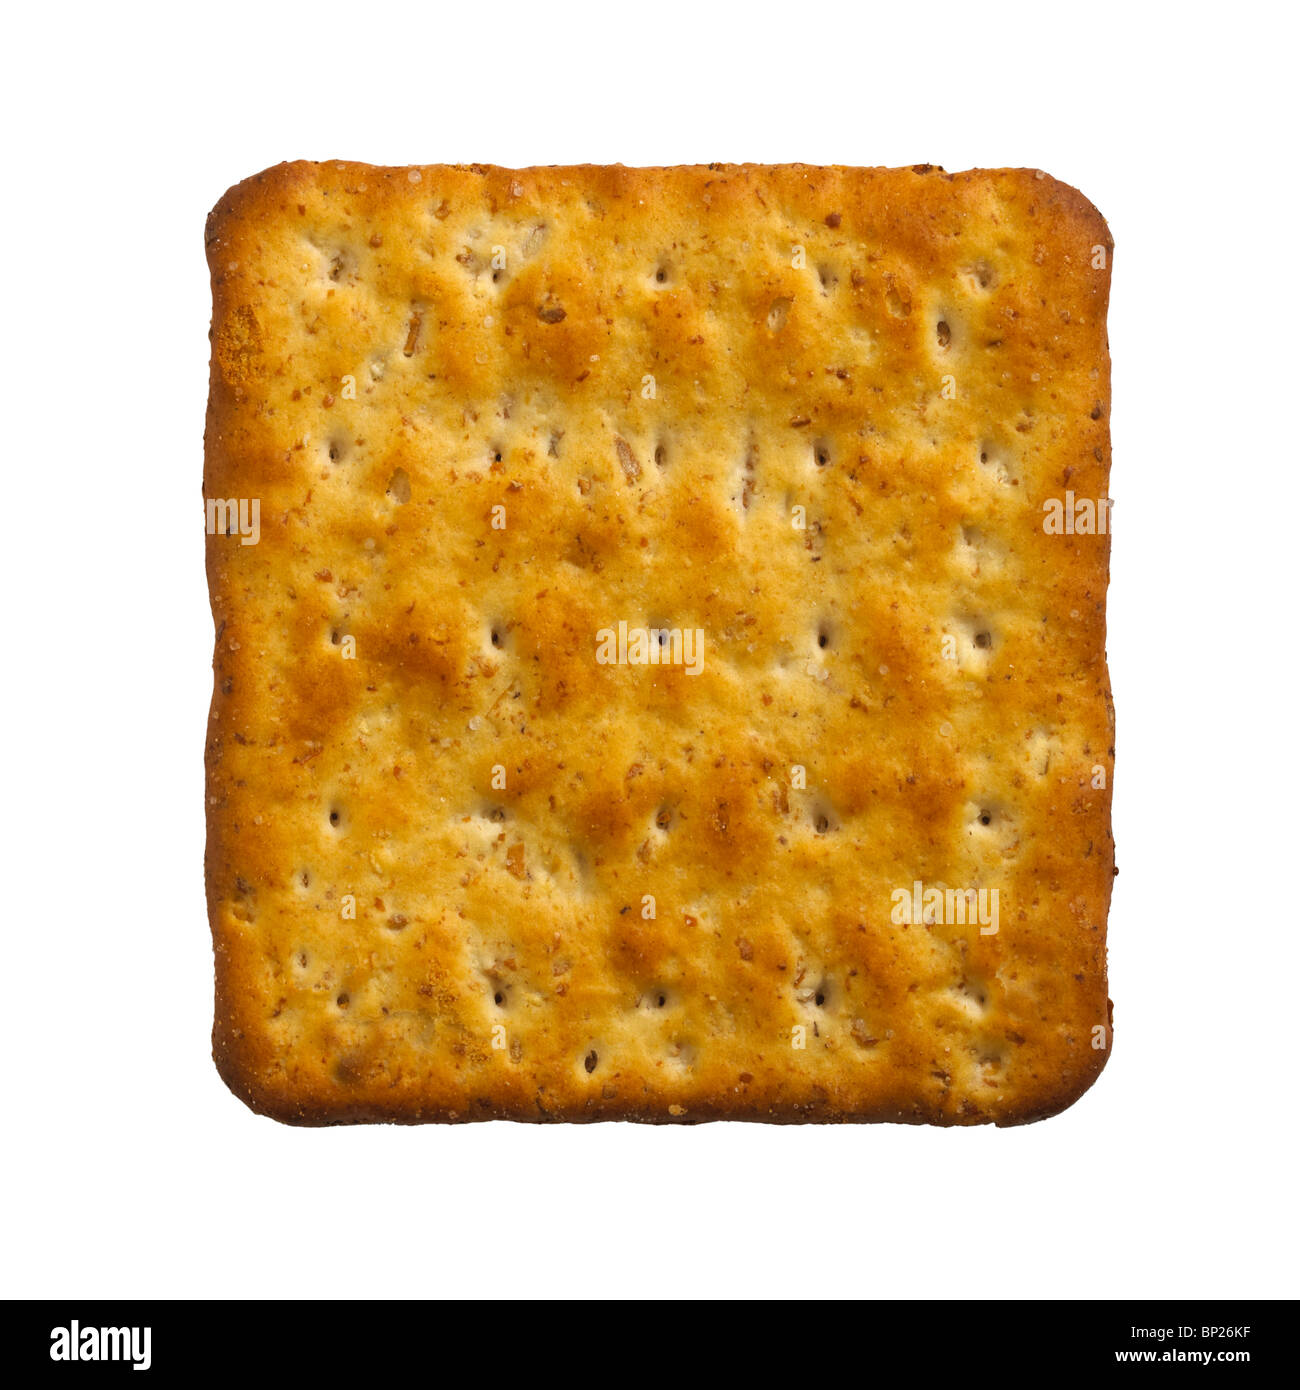 Solo galletas cracker de queso sobre fondo blanco. Imagen De Stock